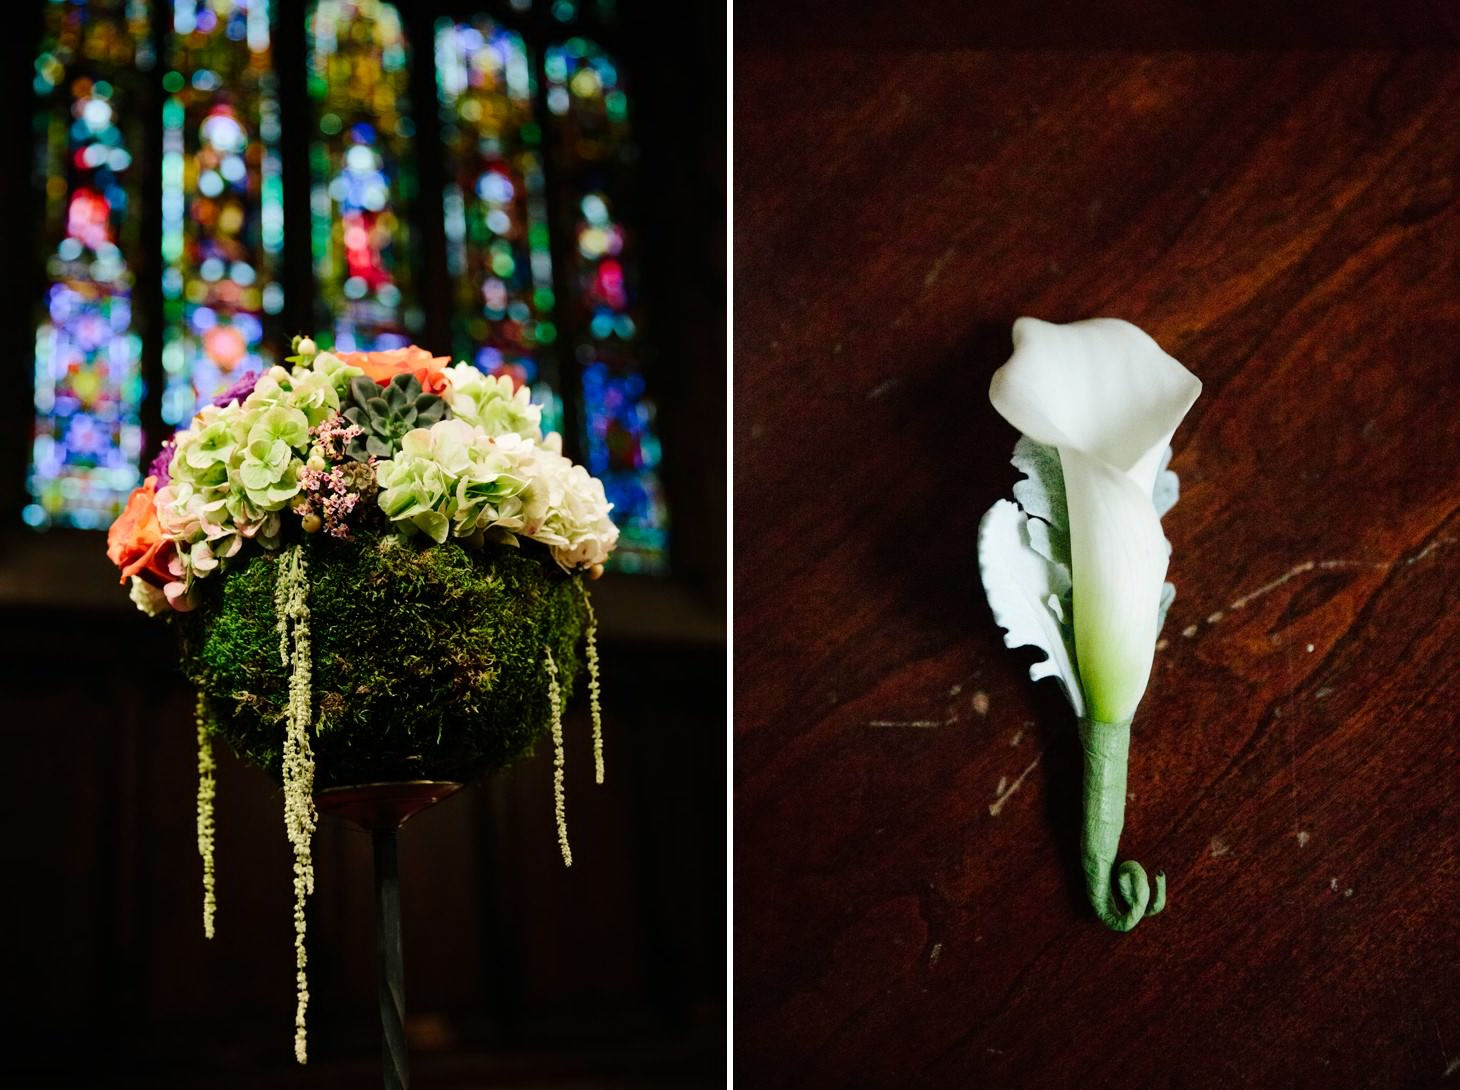 009-nyc-wedding-photographer-hoboken-waterfront-wedding-photos-smitten-chickens.jpg